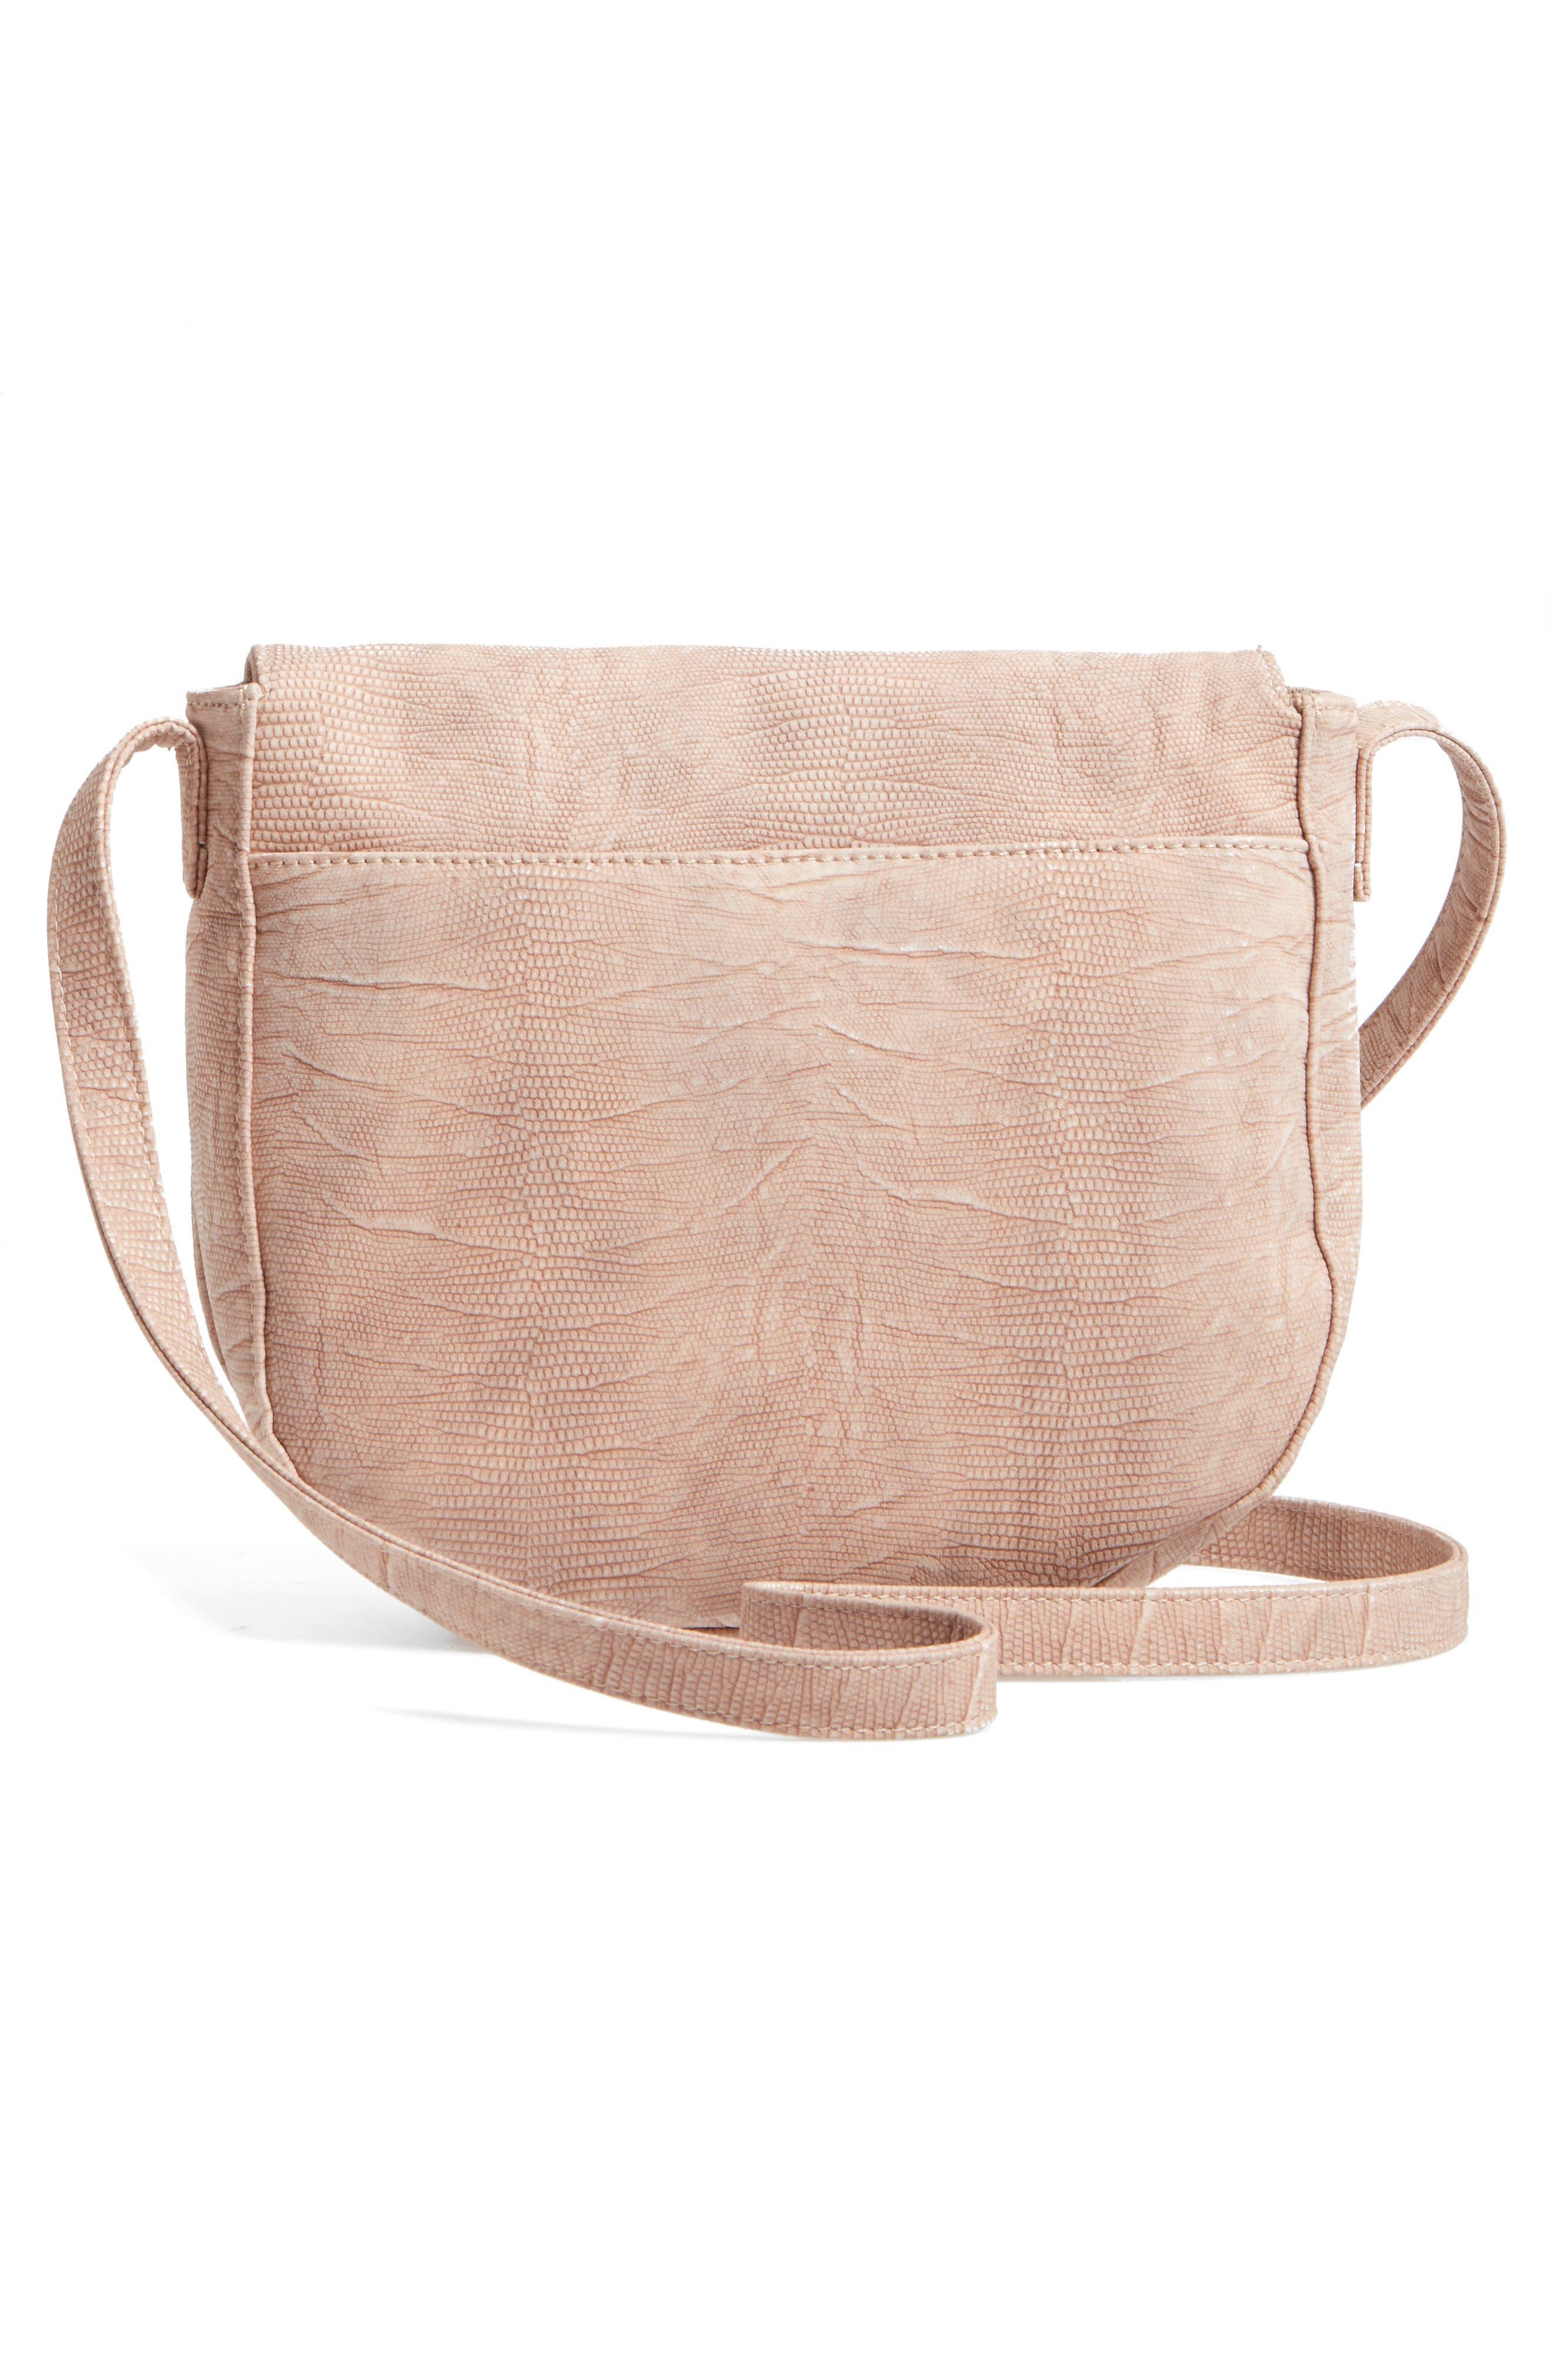 Livvy Faux Leather Crossbody Saddle Bag,                             Alternate thumbnail 8, color,